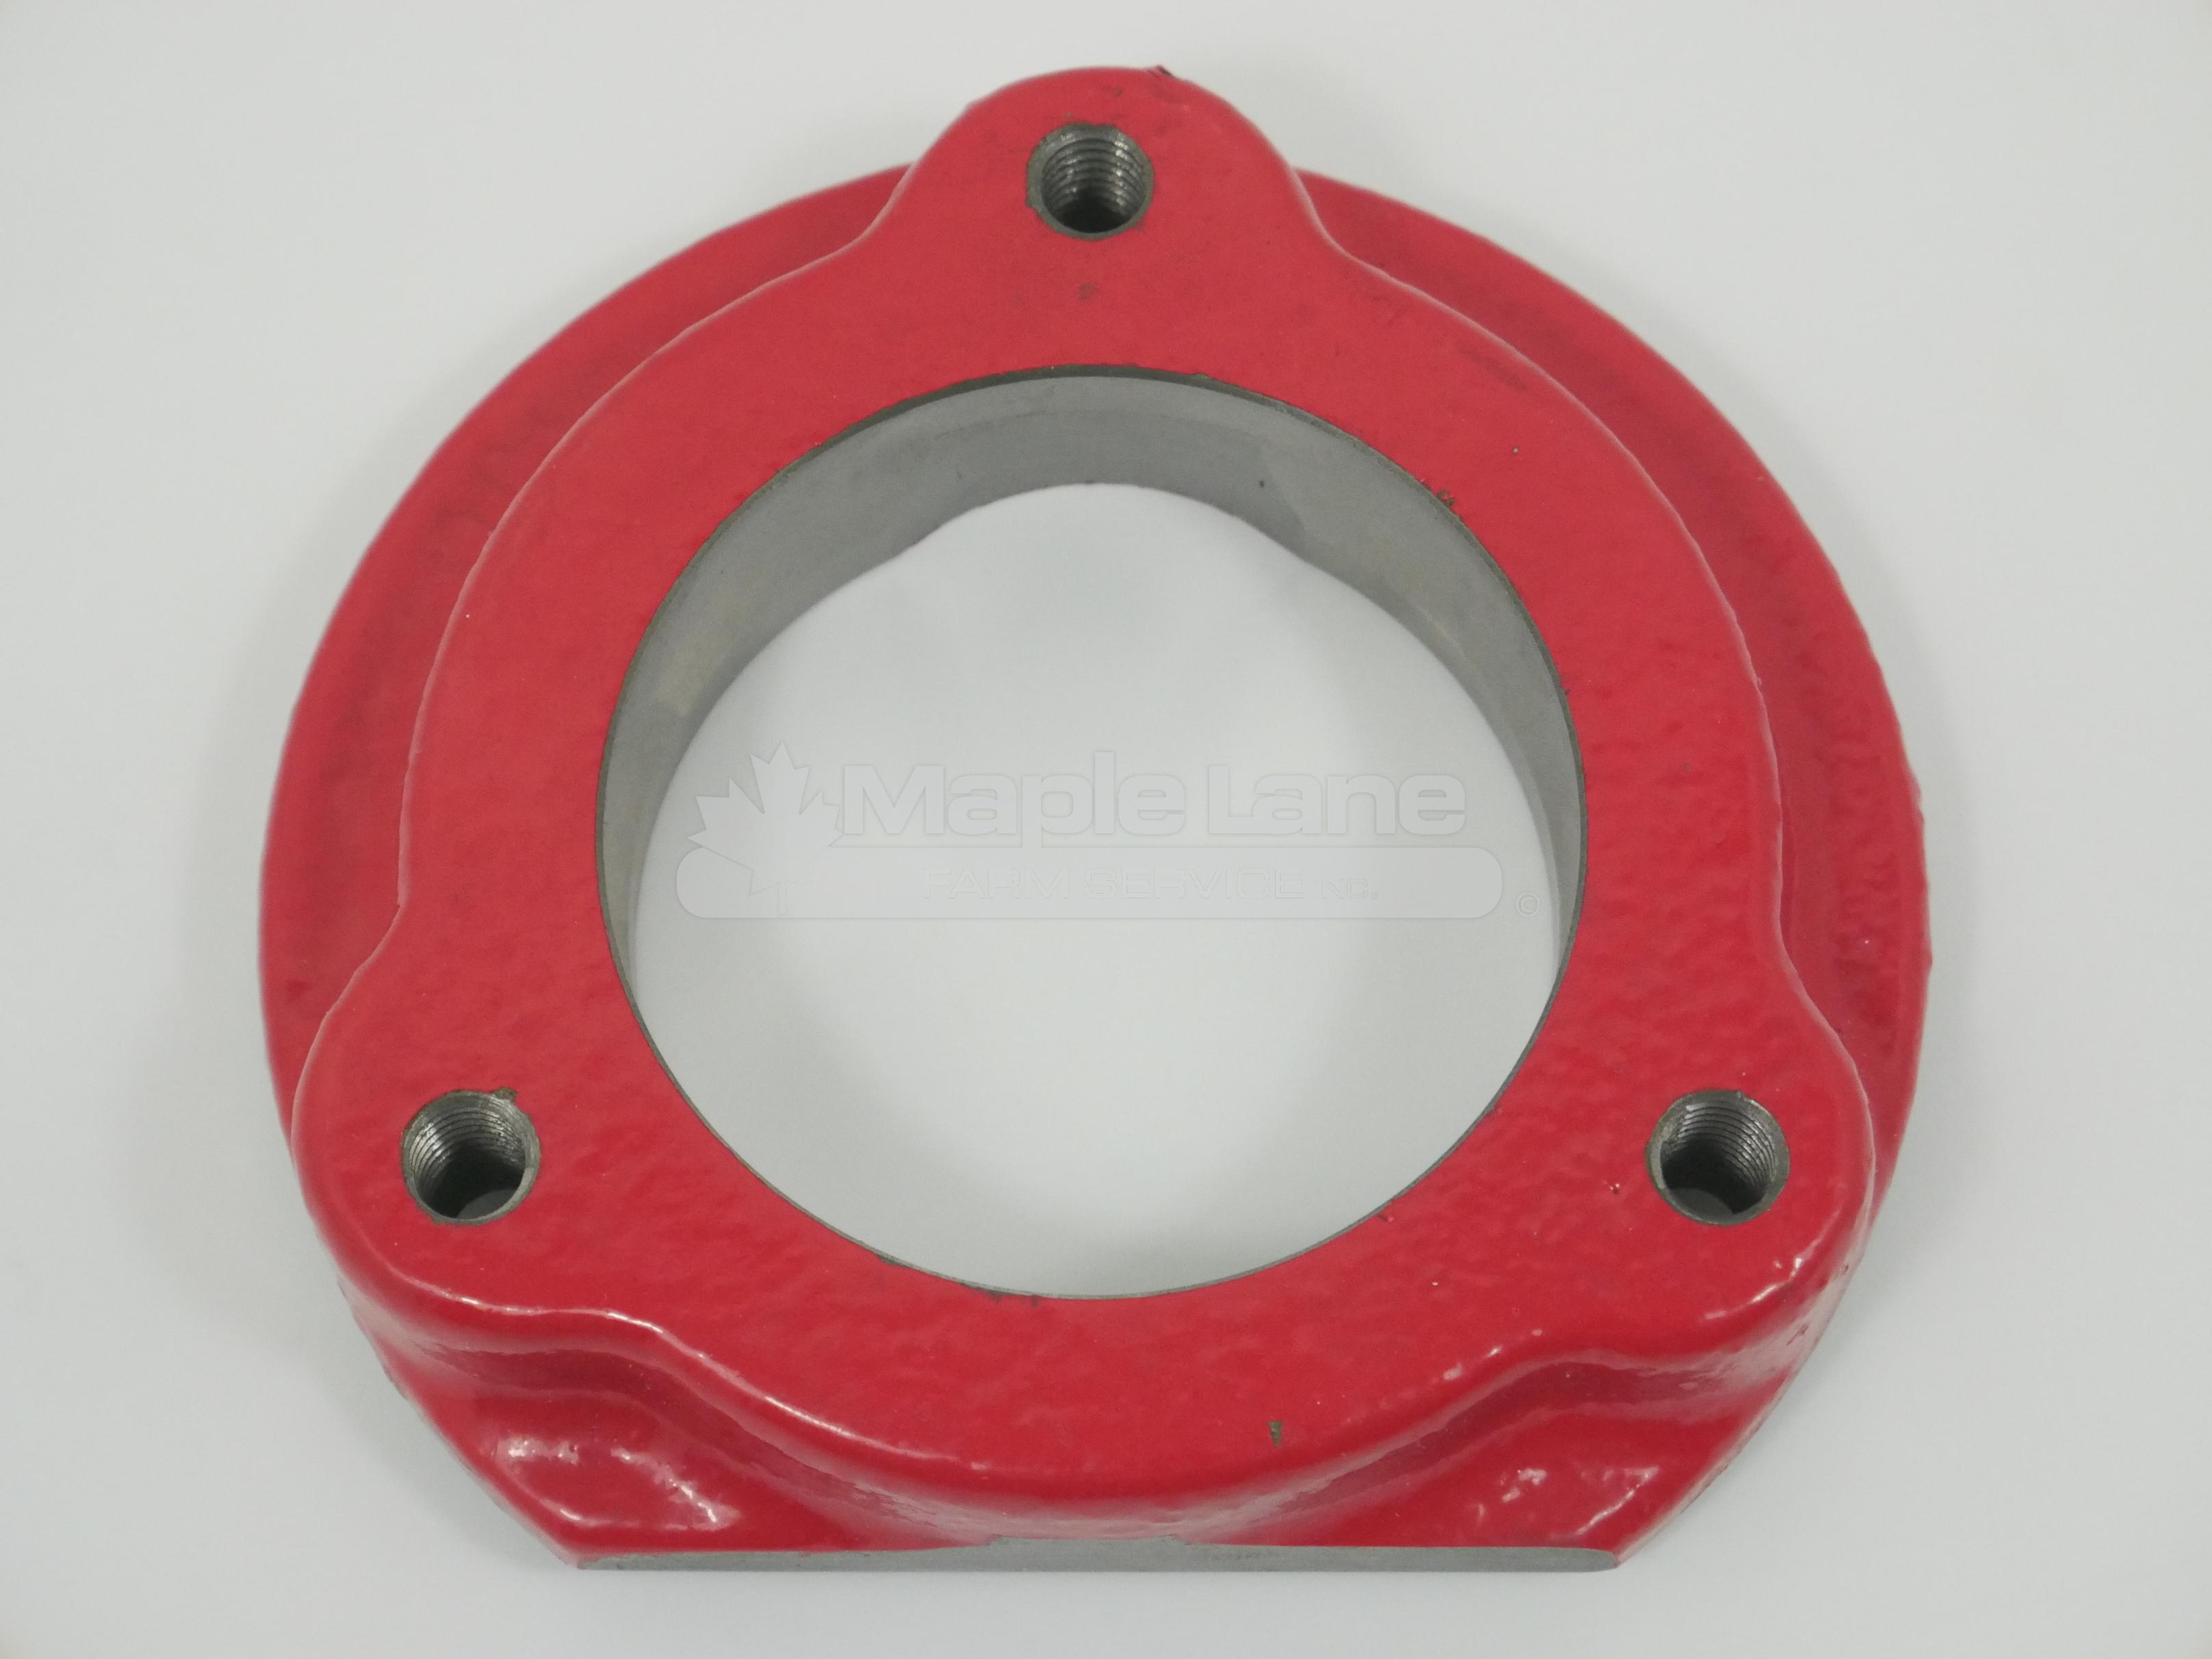 077031 Bearing Retainer